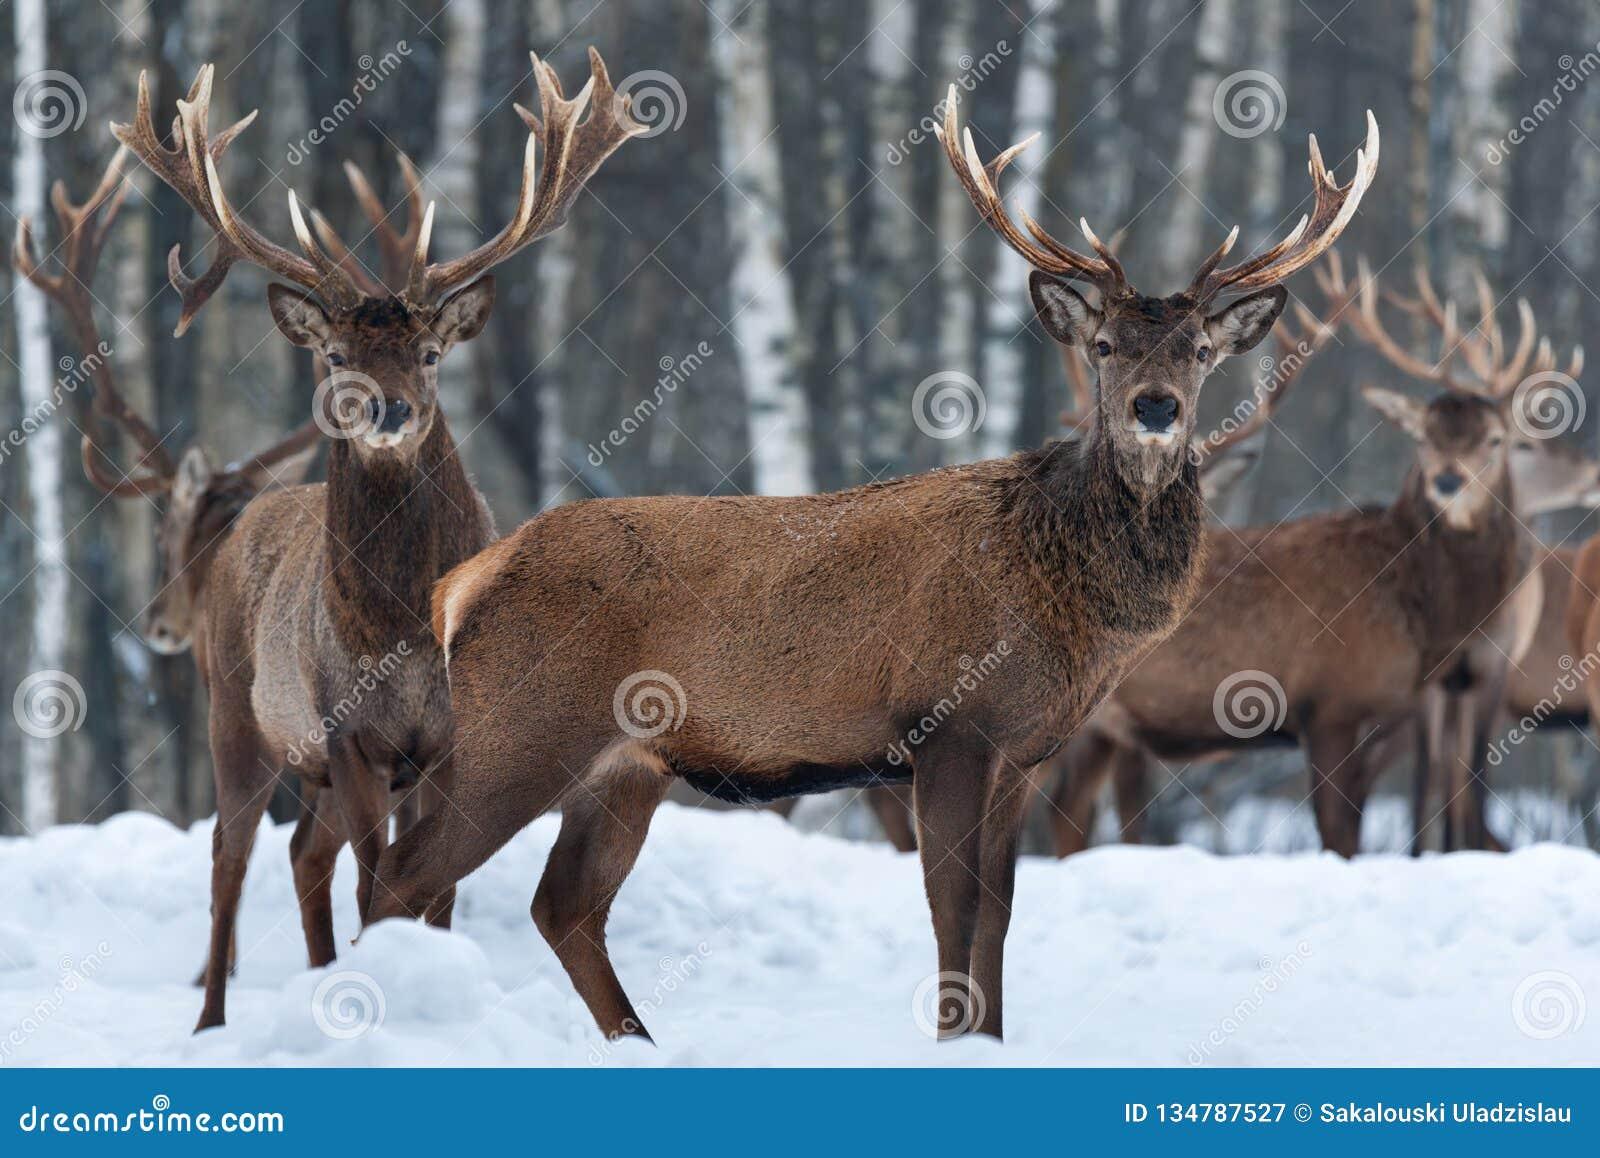 Herd Of Noble Deer Cervus Elaphus In The Natural Habitat In Winter Time: One Buck Stands Sideways In Profile, Others - Front